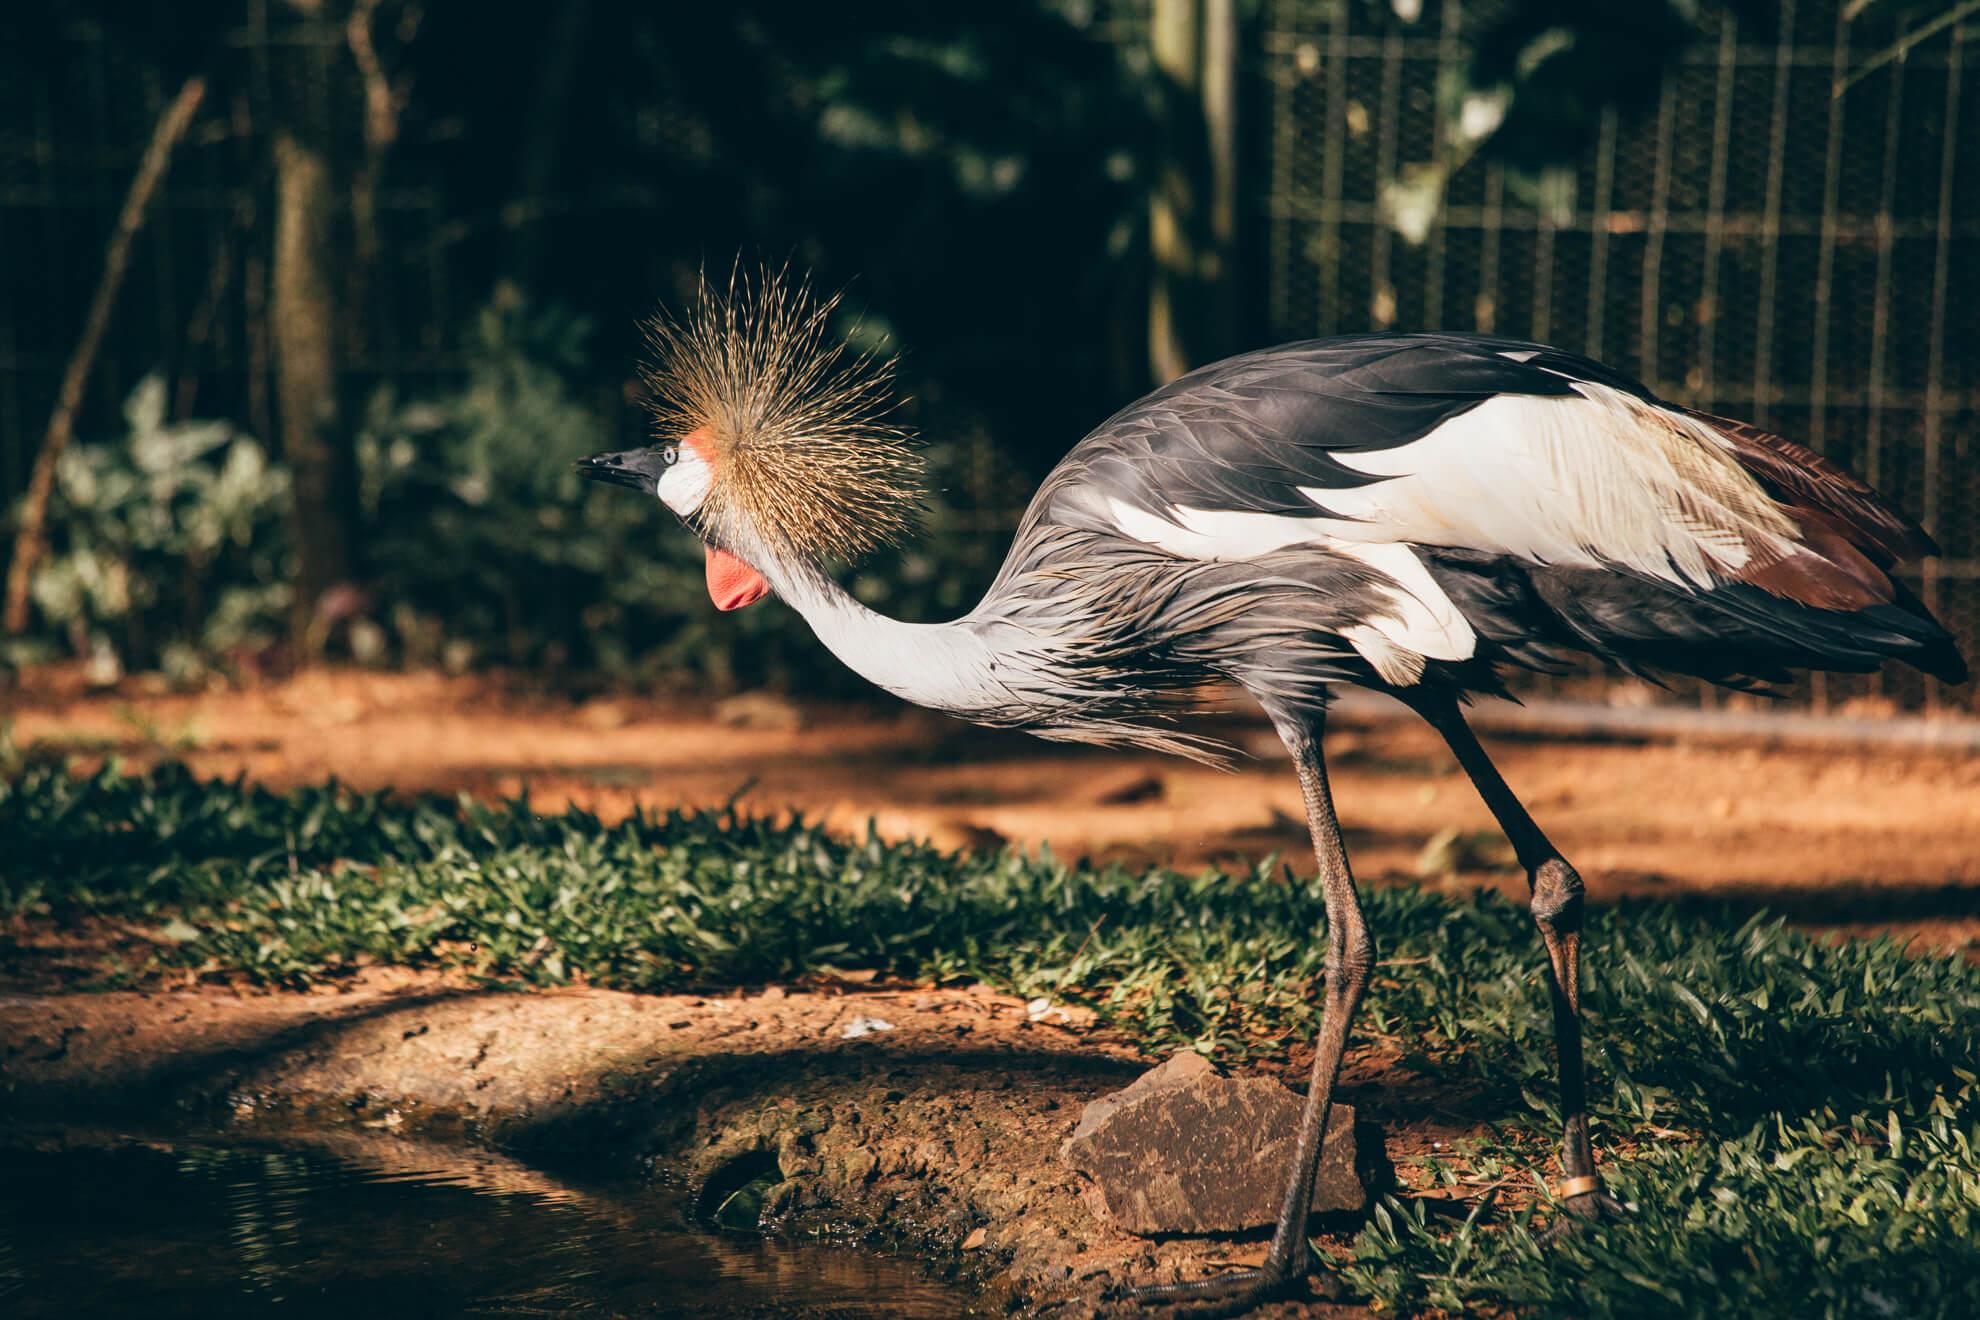 Grou-coroado - Backstage Experience, Parque das Aves